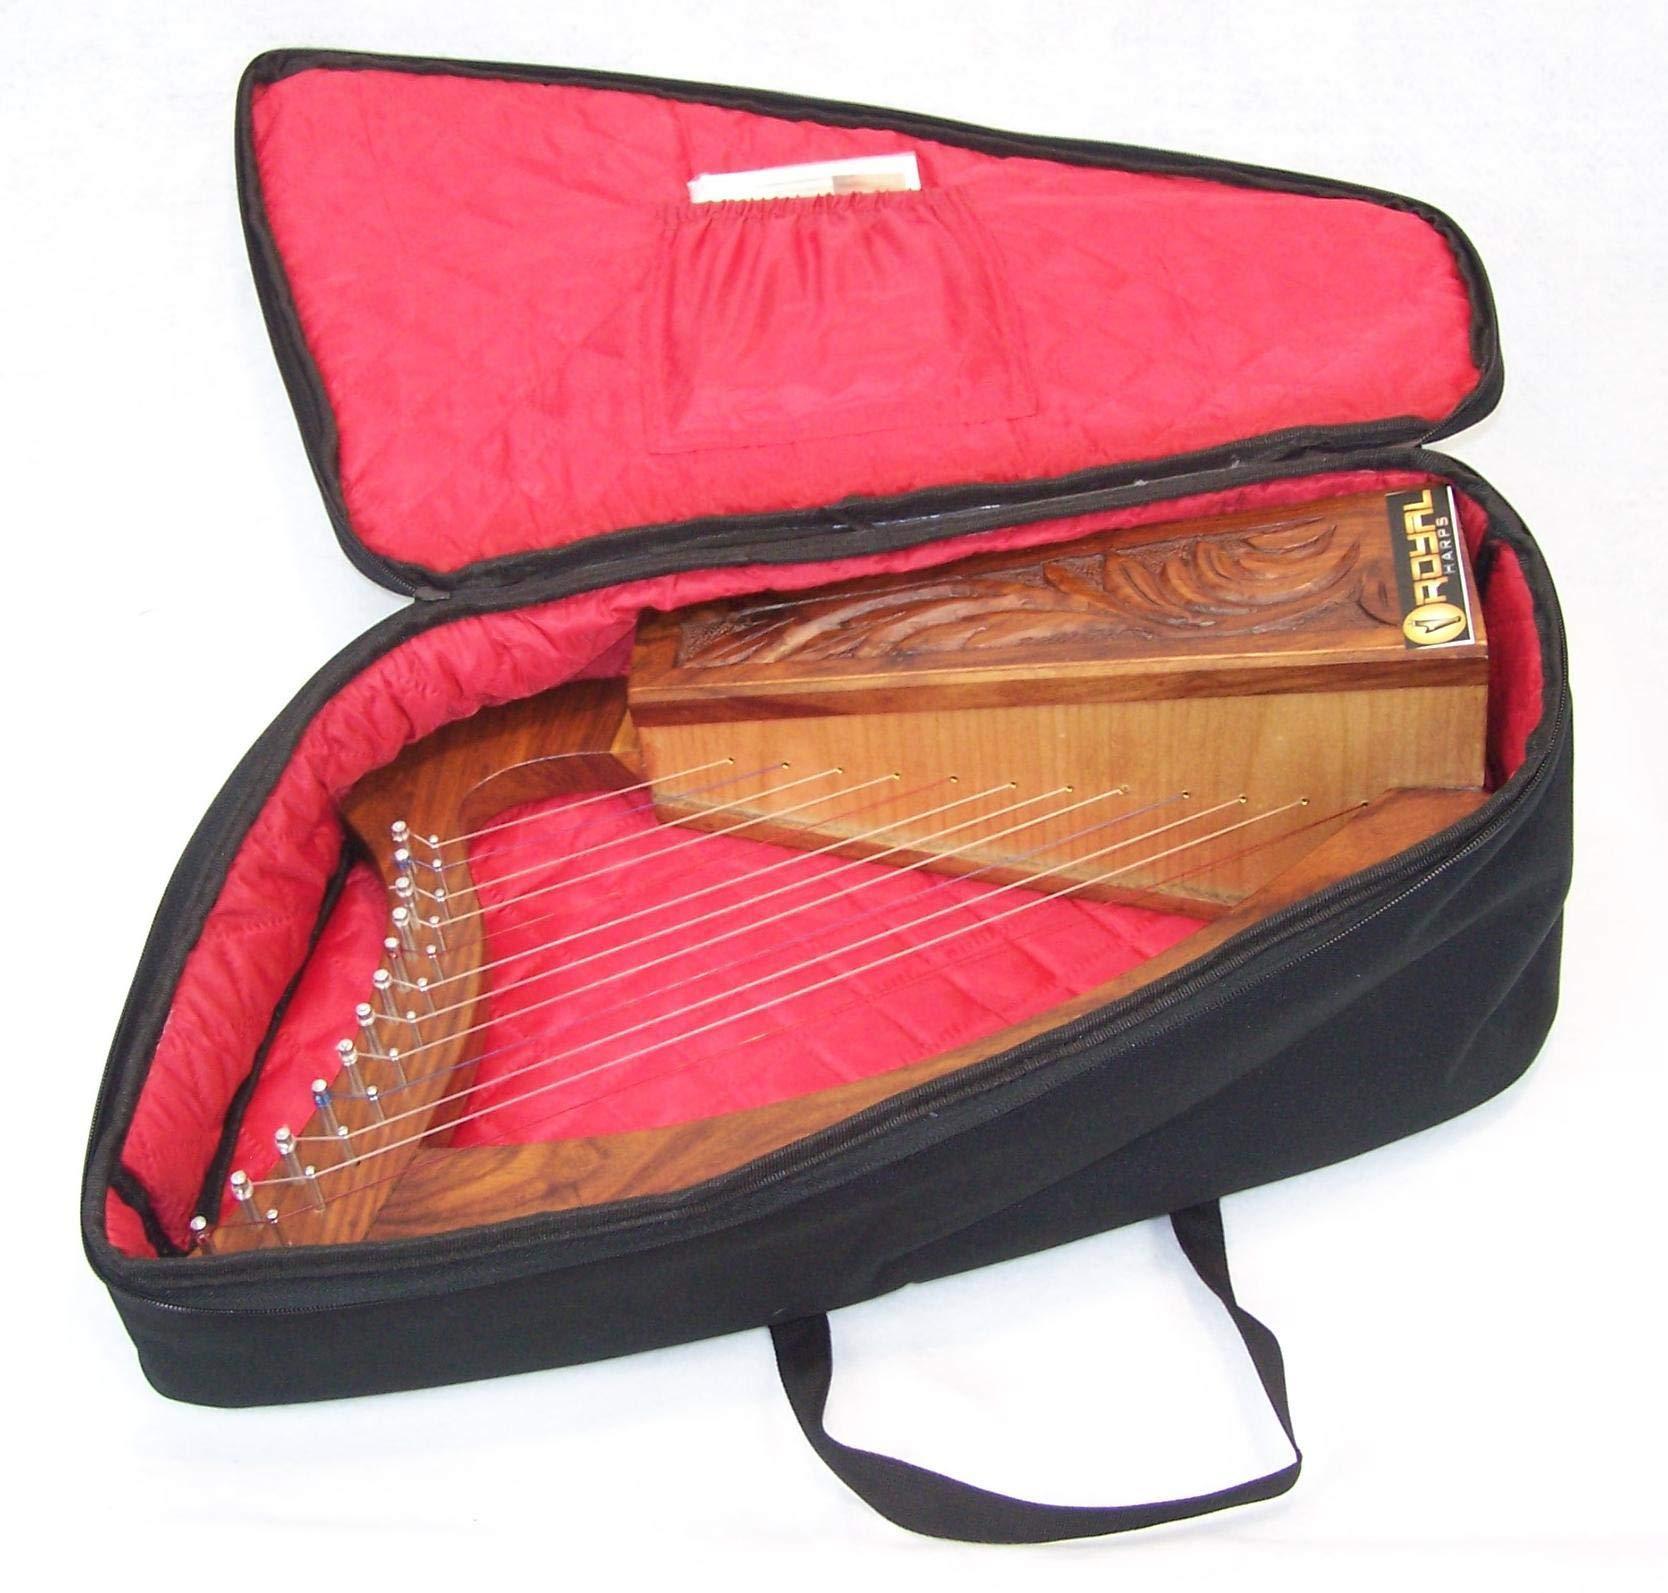 Celtic Irish Baby Harp 12 Strings Solid Wood Free Bag Strings Key by ROYAL HARPS (Image #3)